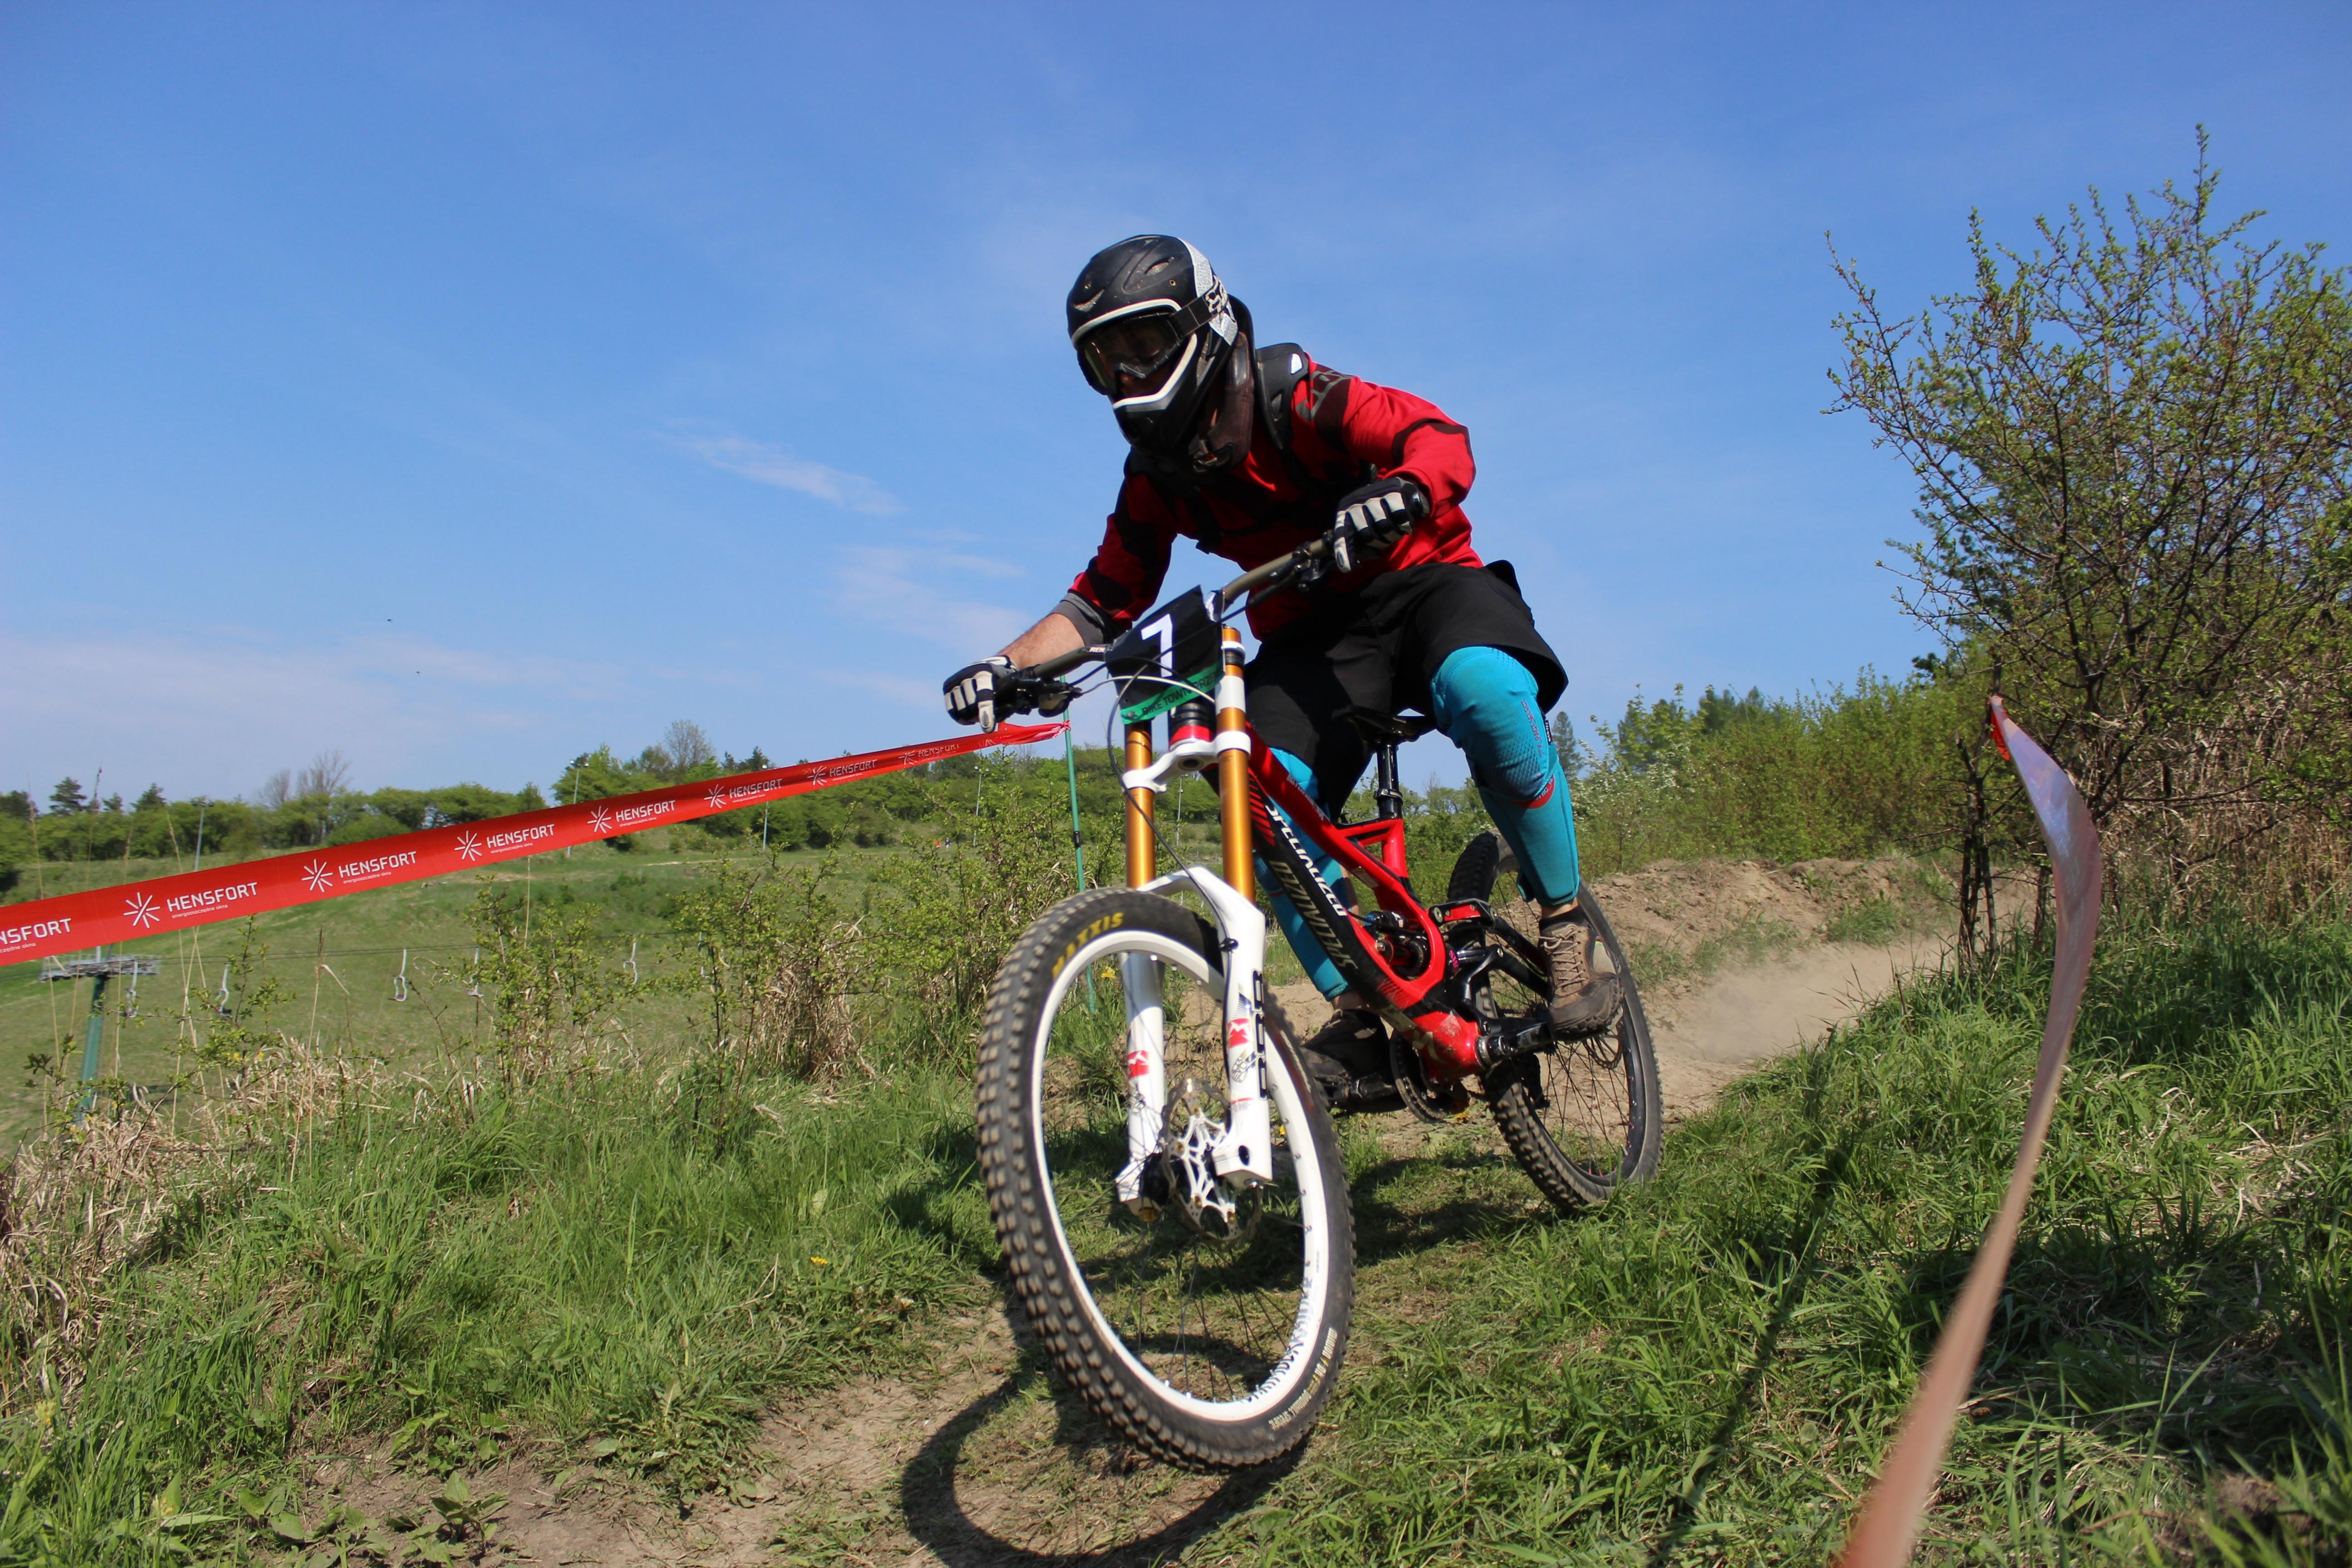 Images Gratuites Homme Paysage Gens Circulation Bicyclette